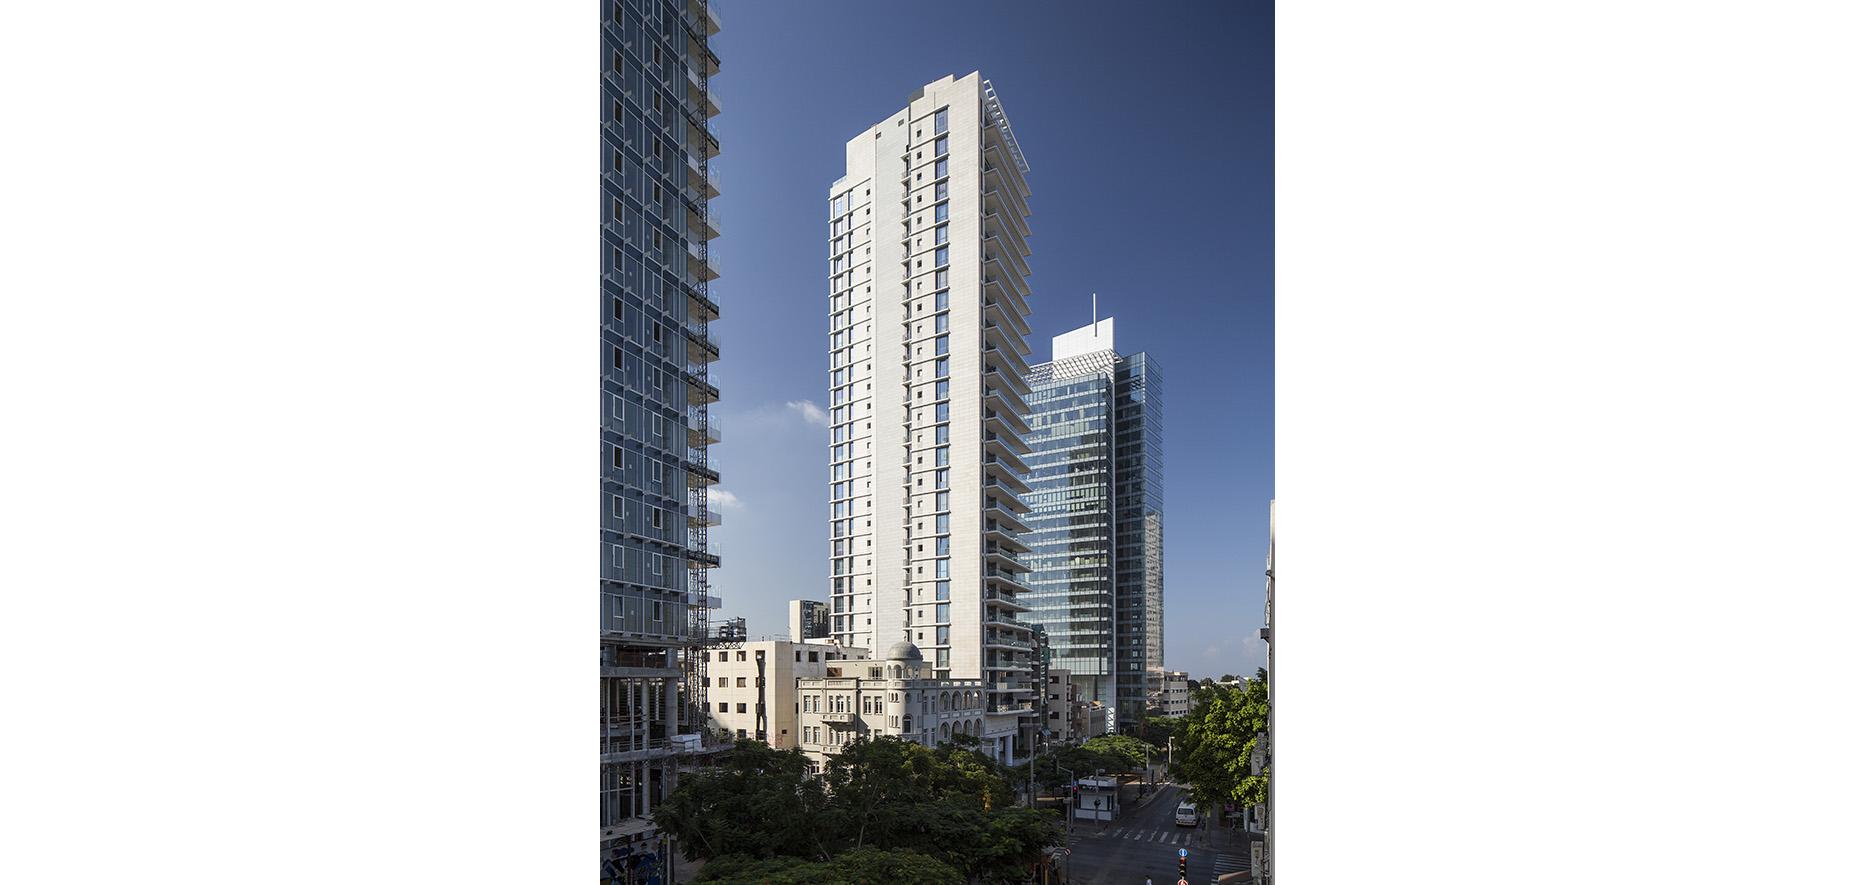 Rothschild_30_Tower_Tel_Aviv_planned_By_Kolker_Epstein_Architects3